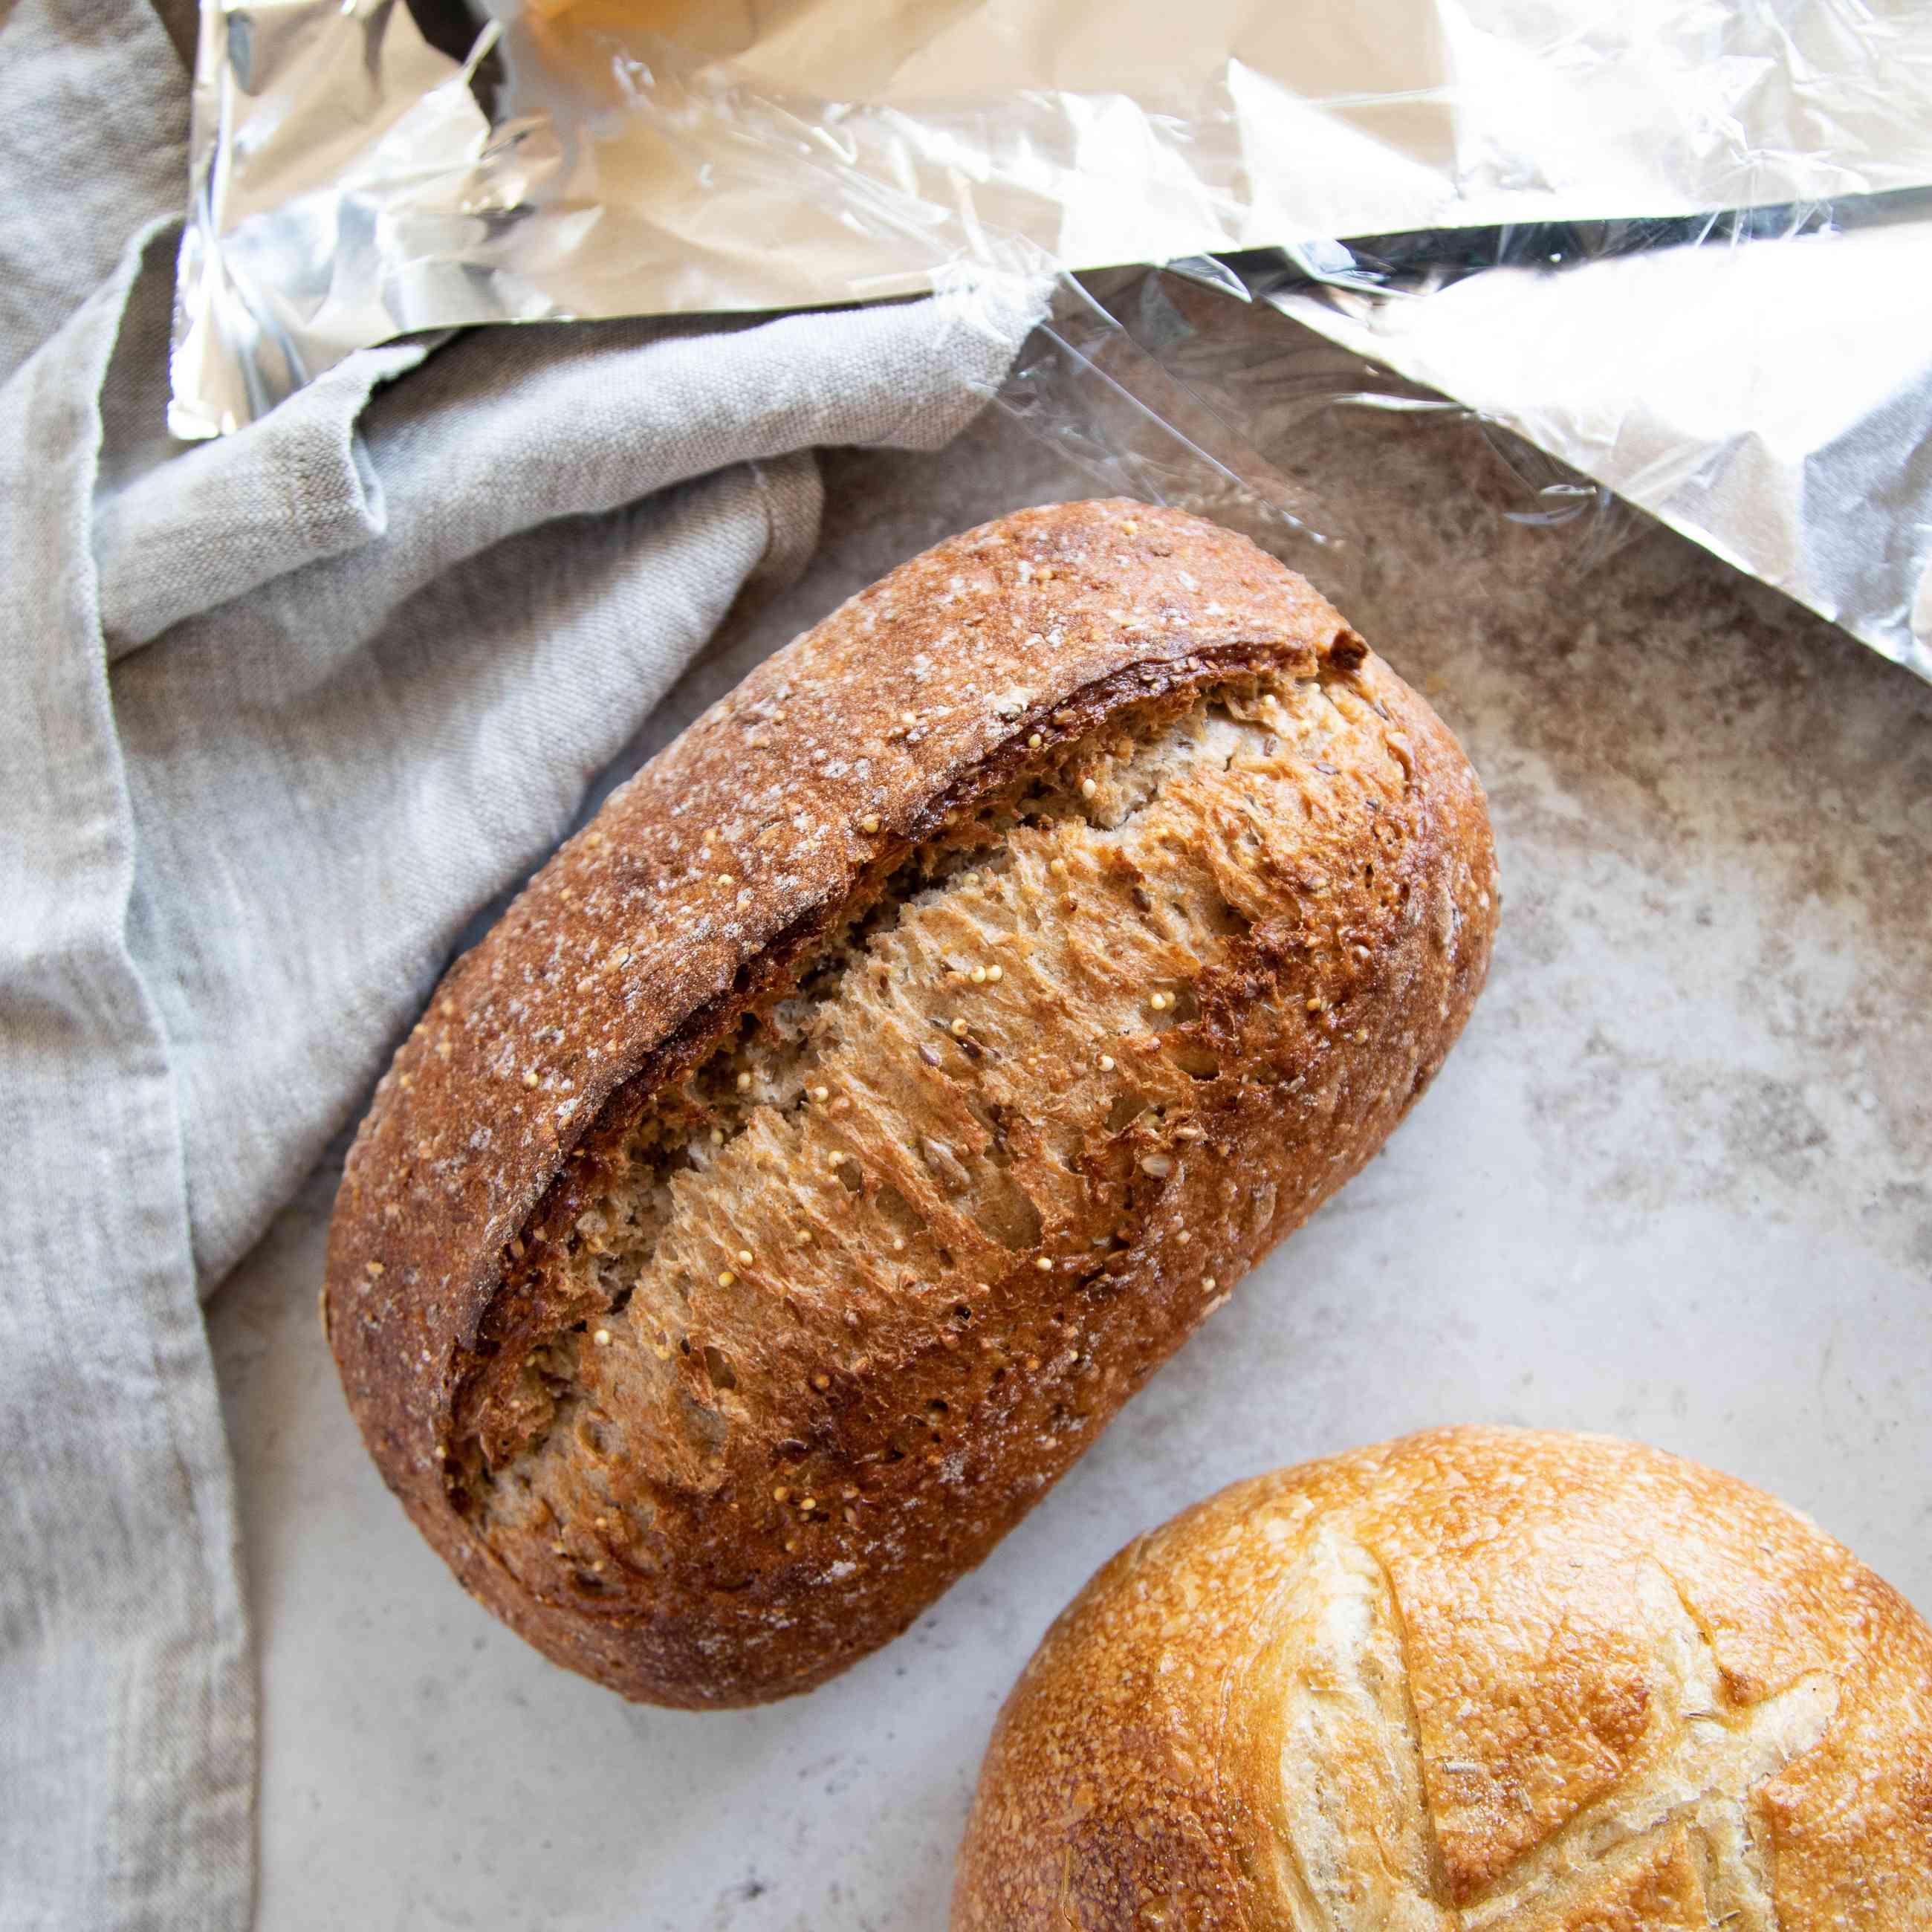 Artisan bread loaves and saran wrap